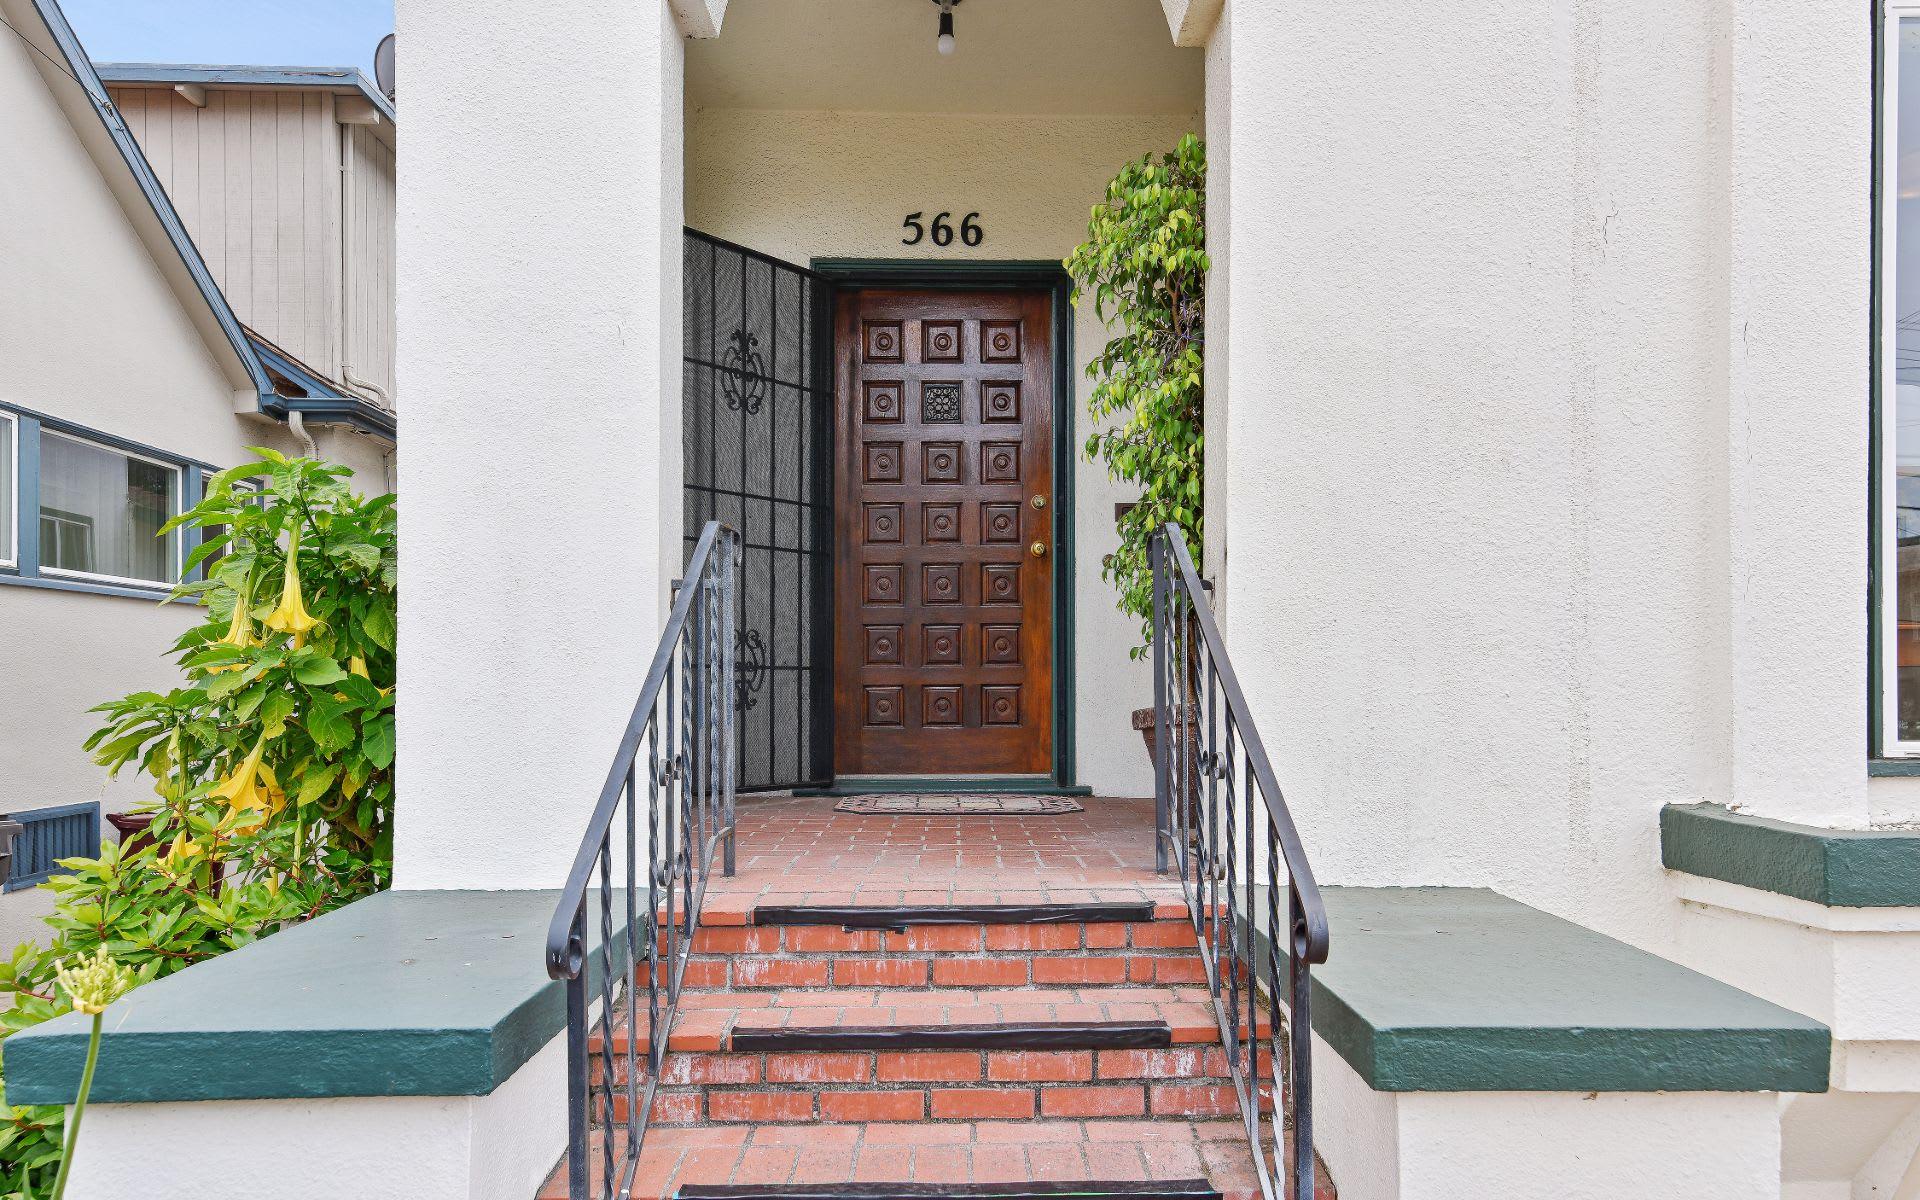 566 Montclair Ave photo